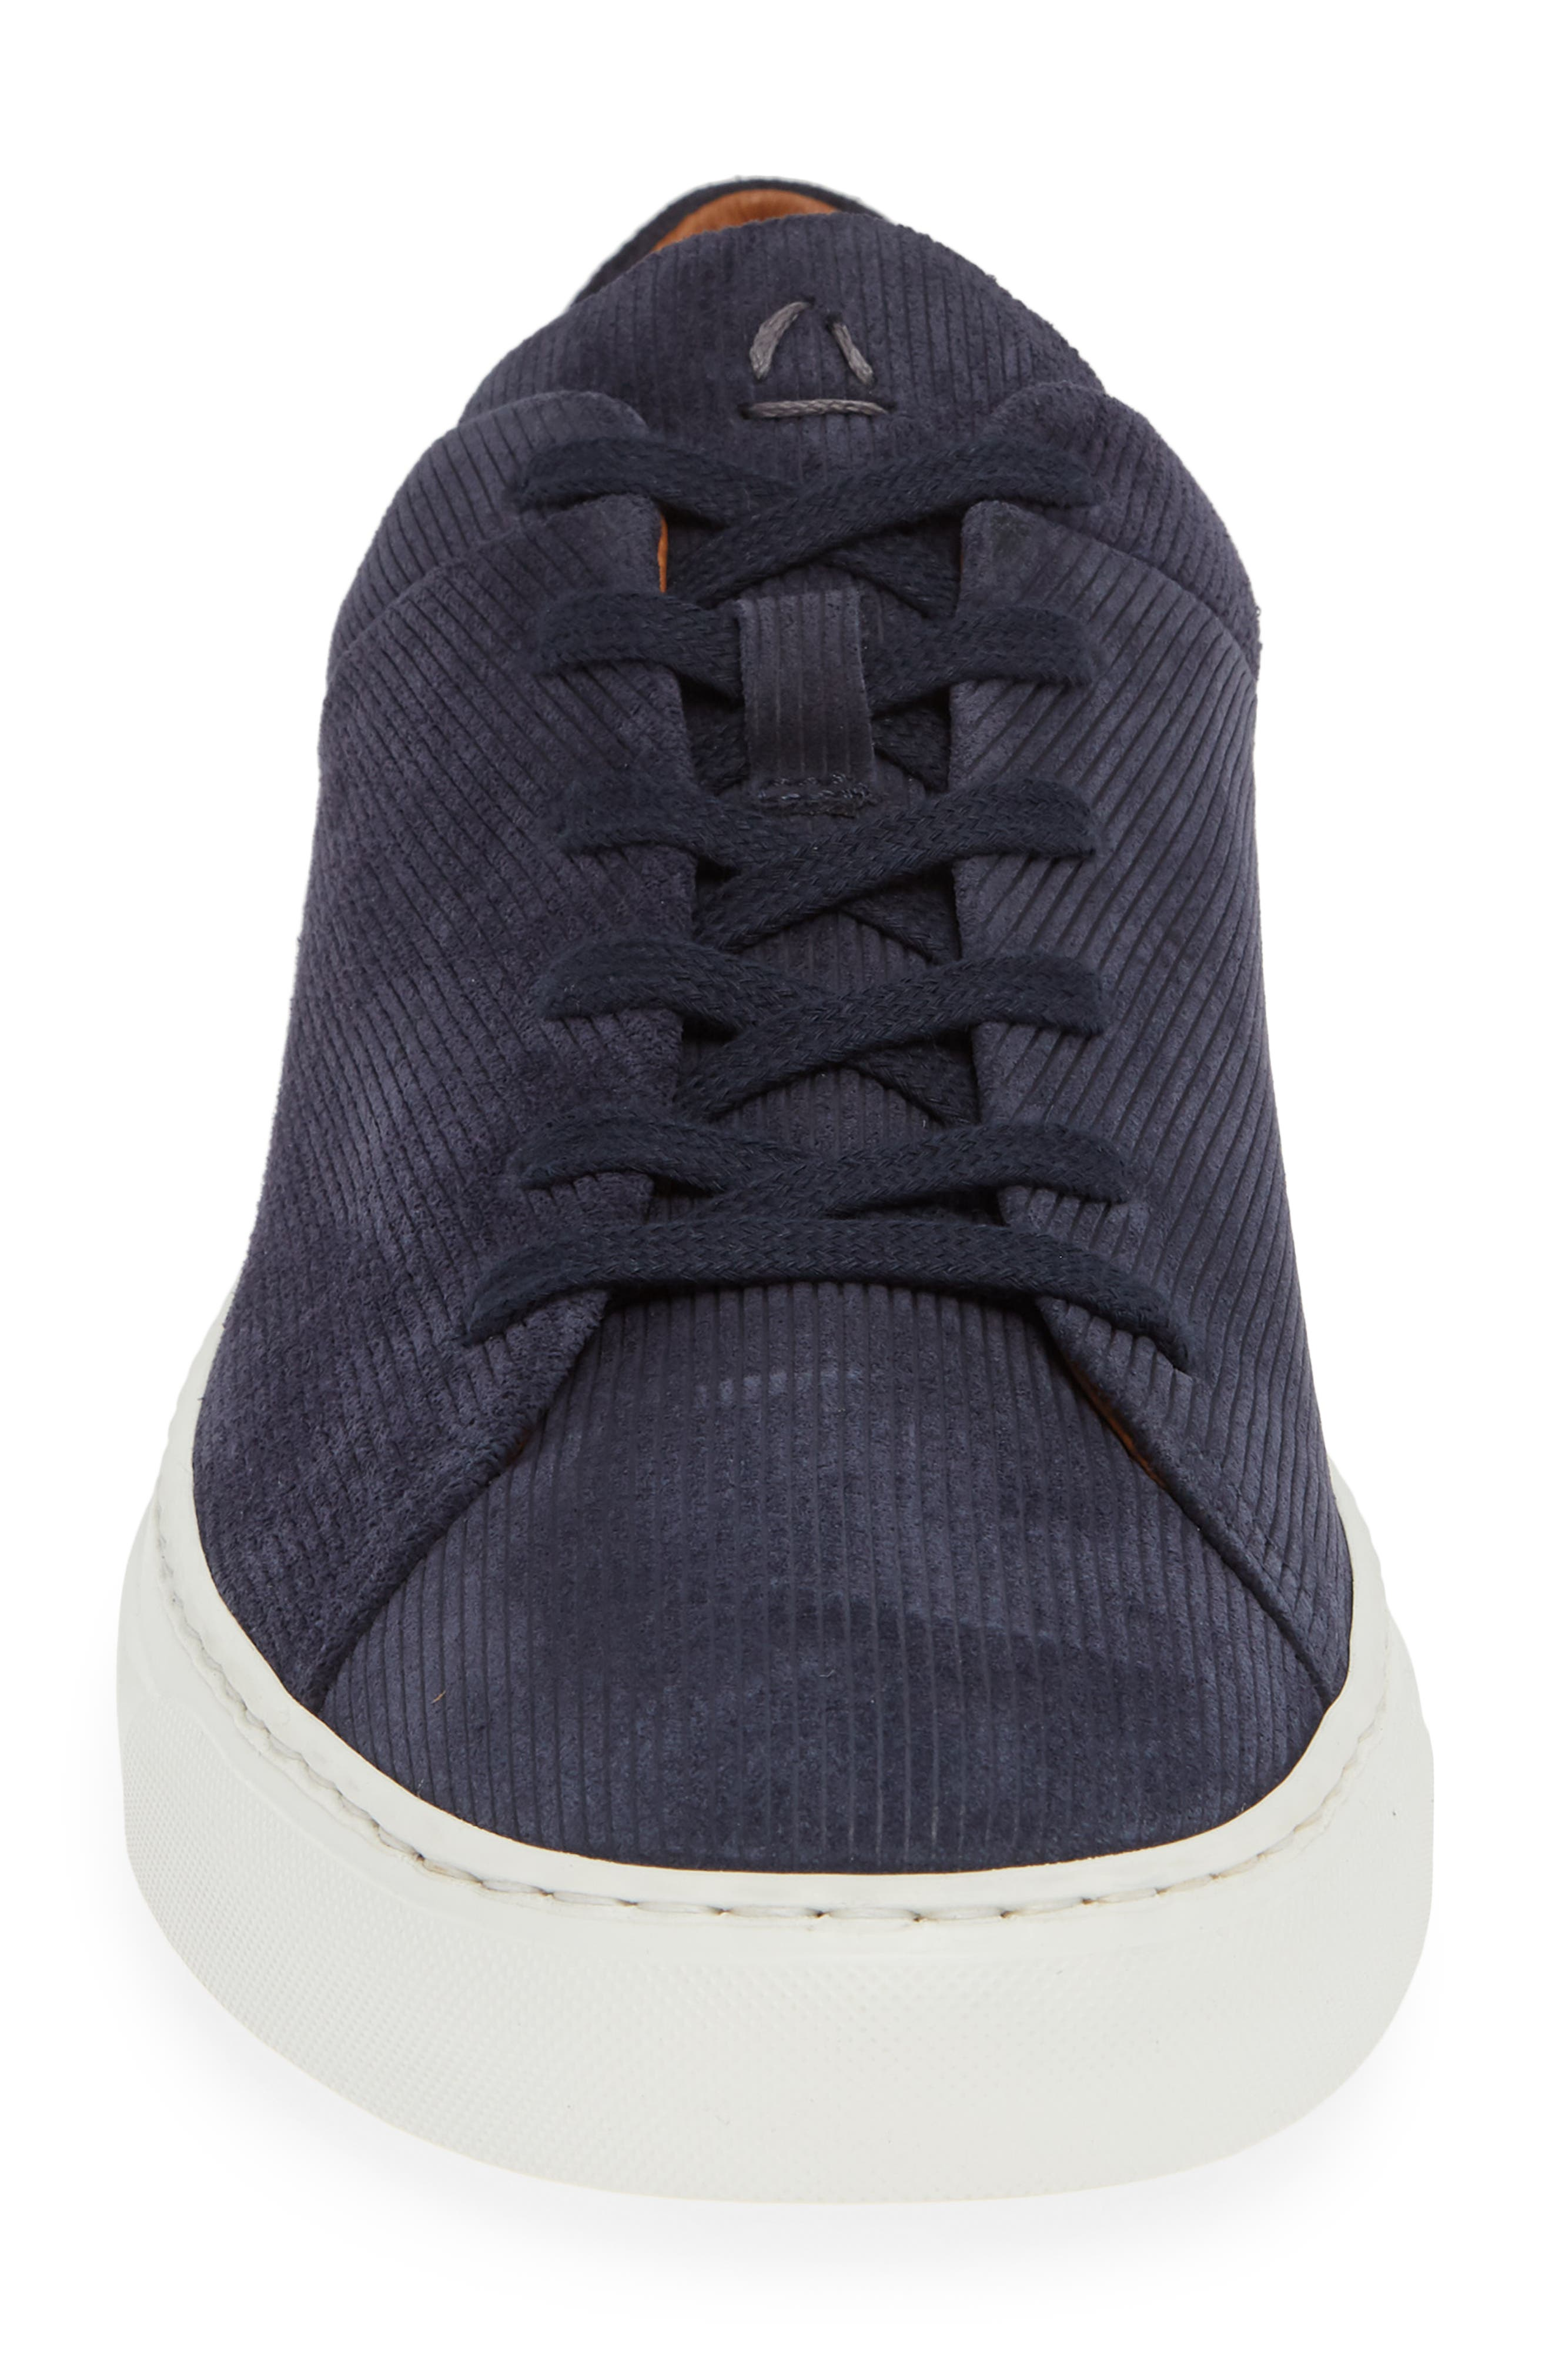 Alaric Sneaker,                             Alternate thumbnail 3, color,                             Navy Suede